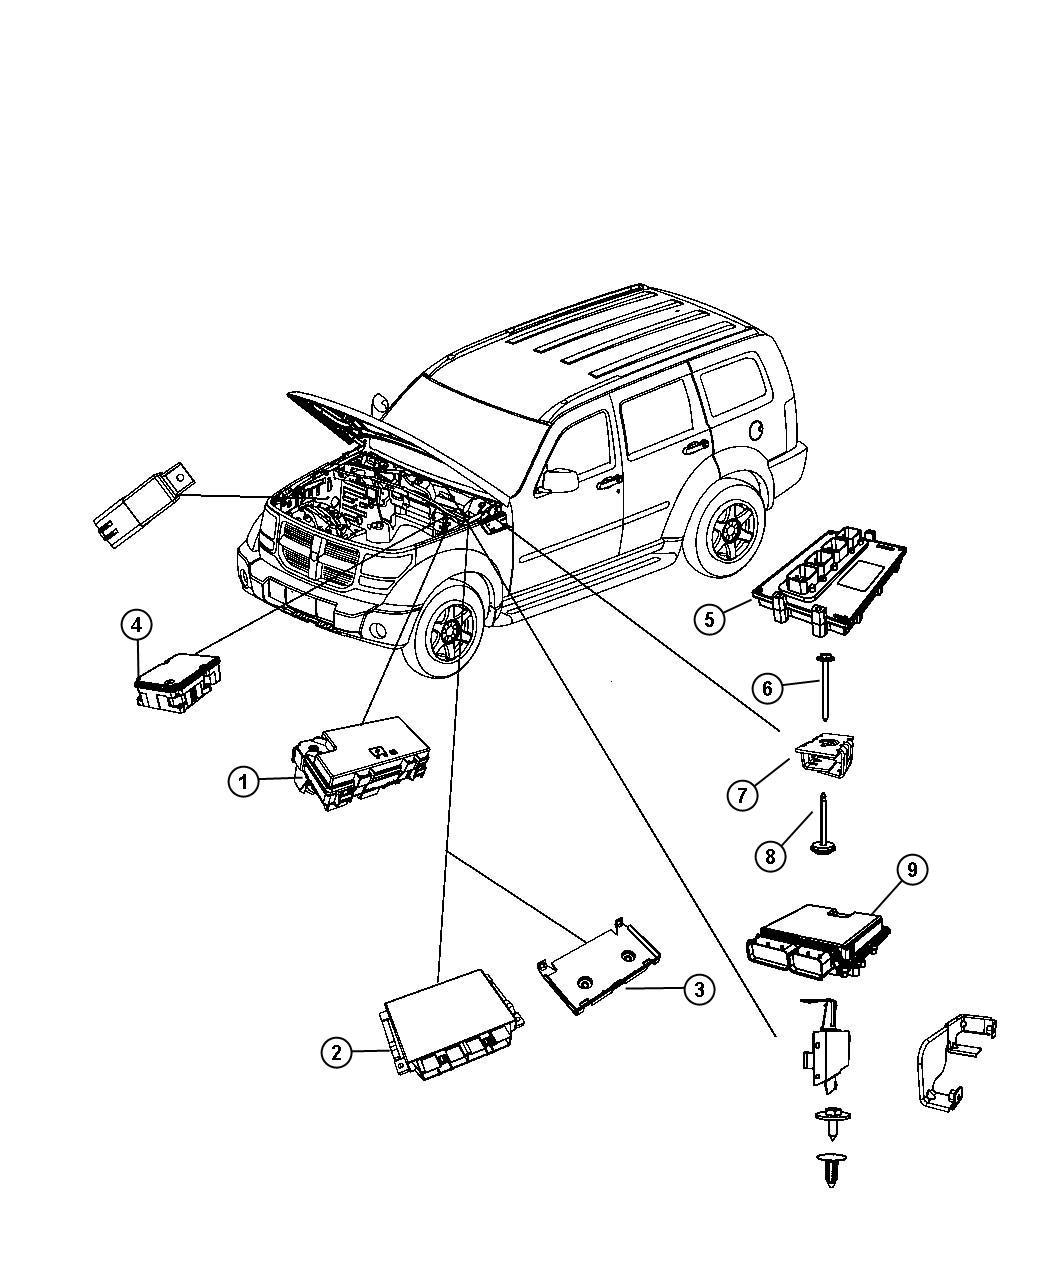 Dodge NITRO Module. Engine controller. Particulate, dpf